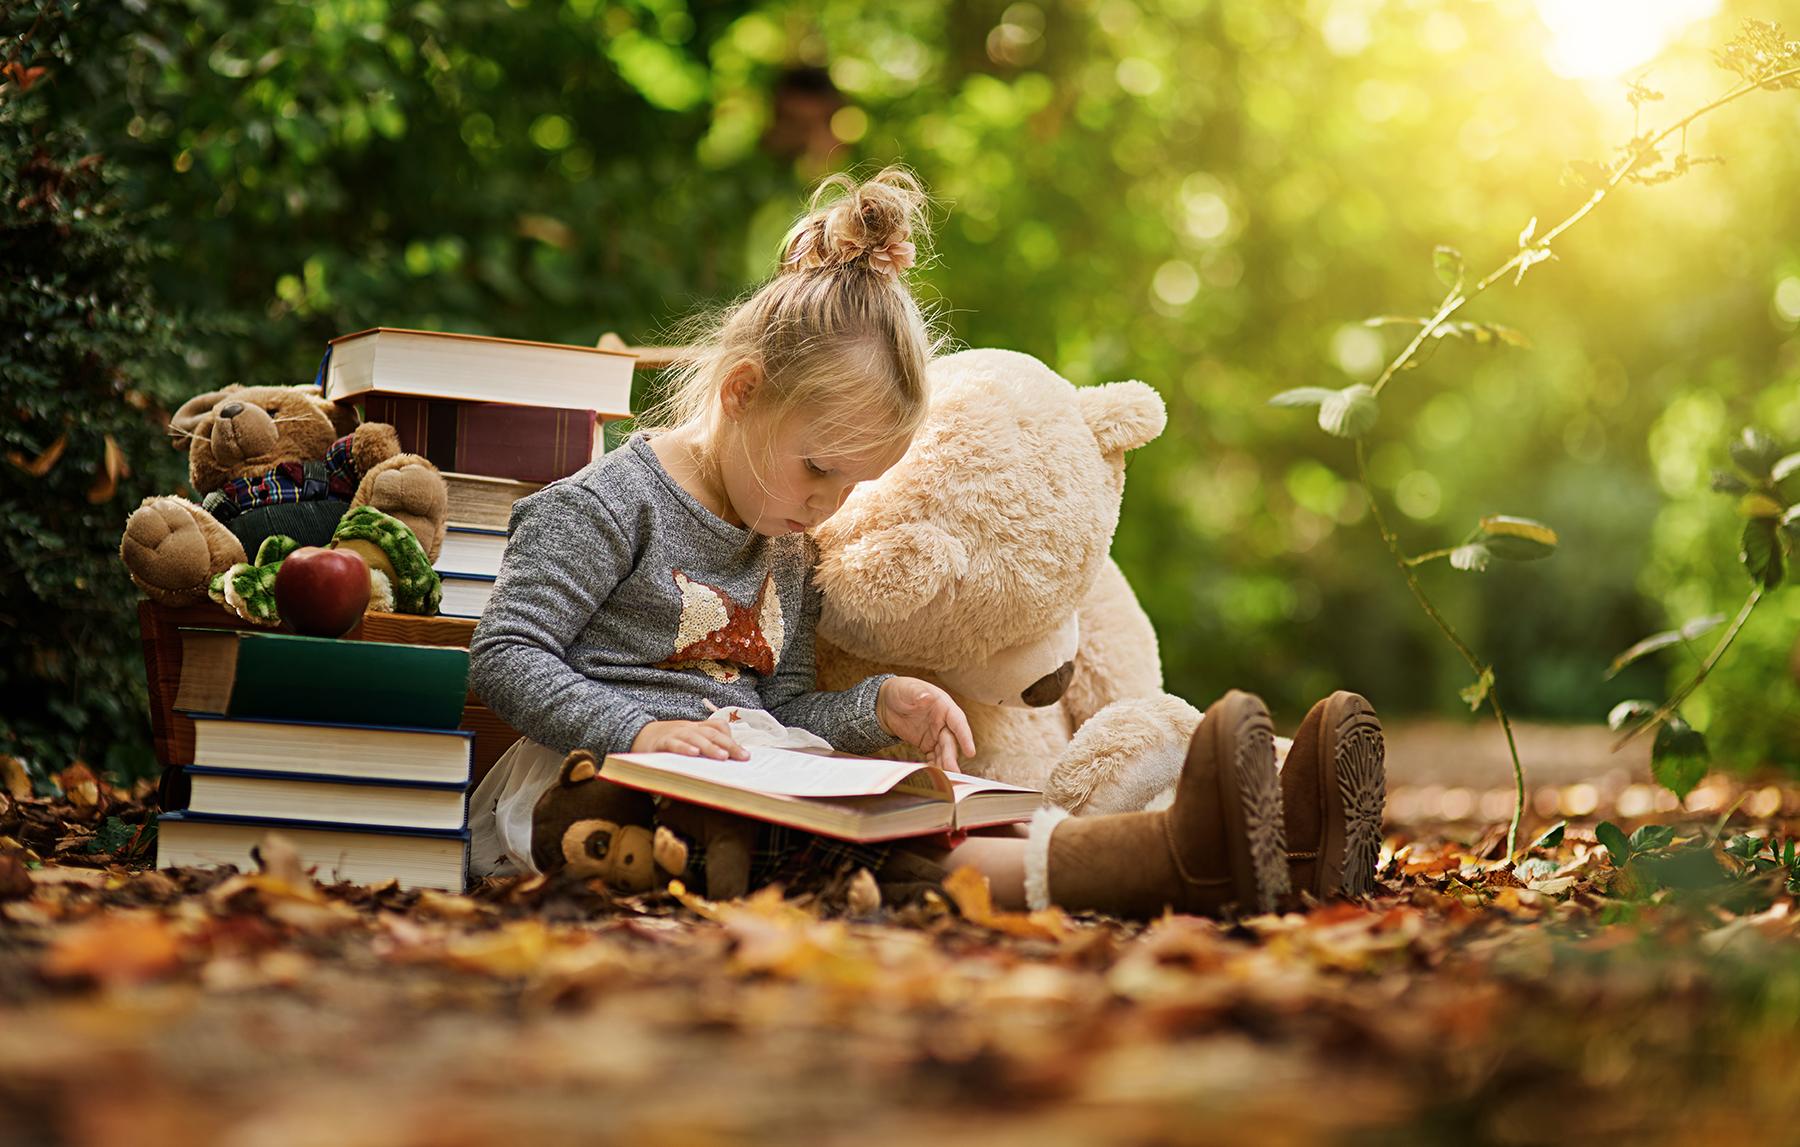 Reading takes us somewhere else